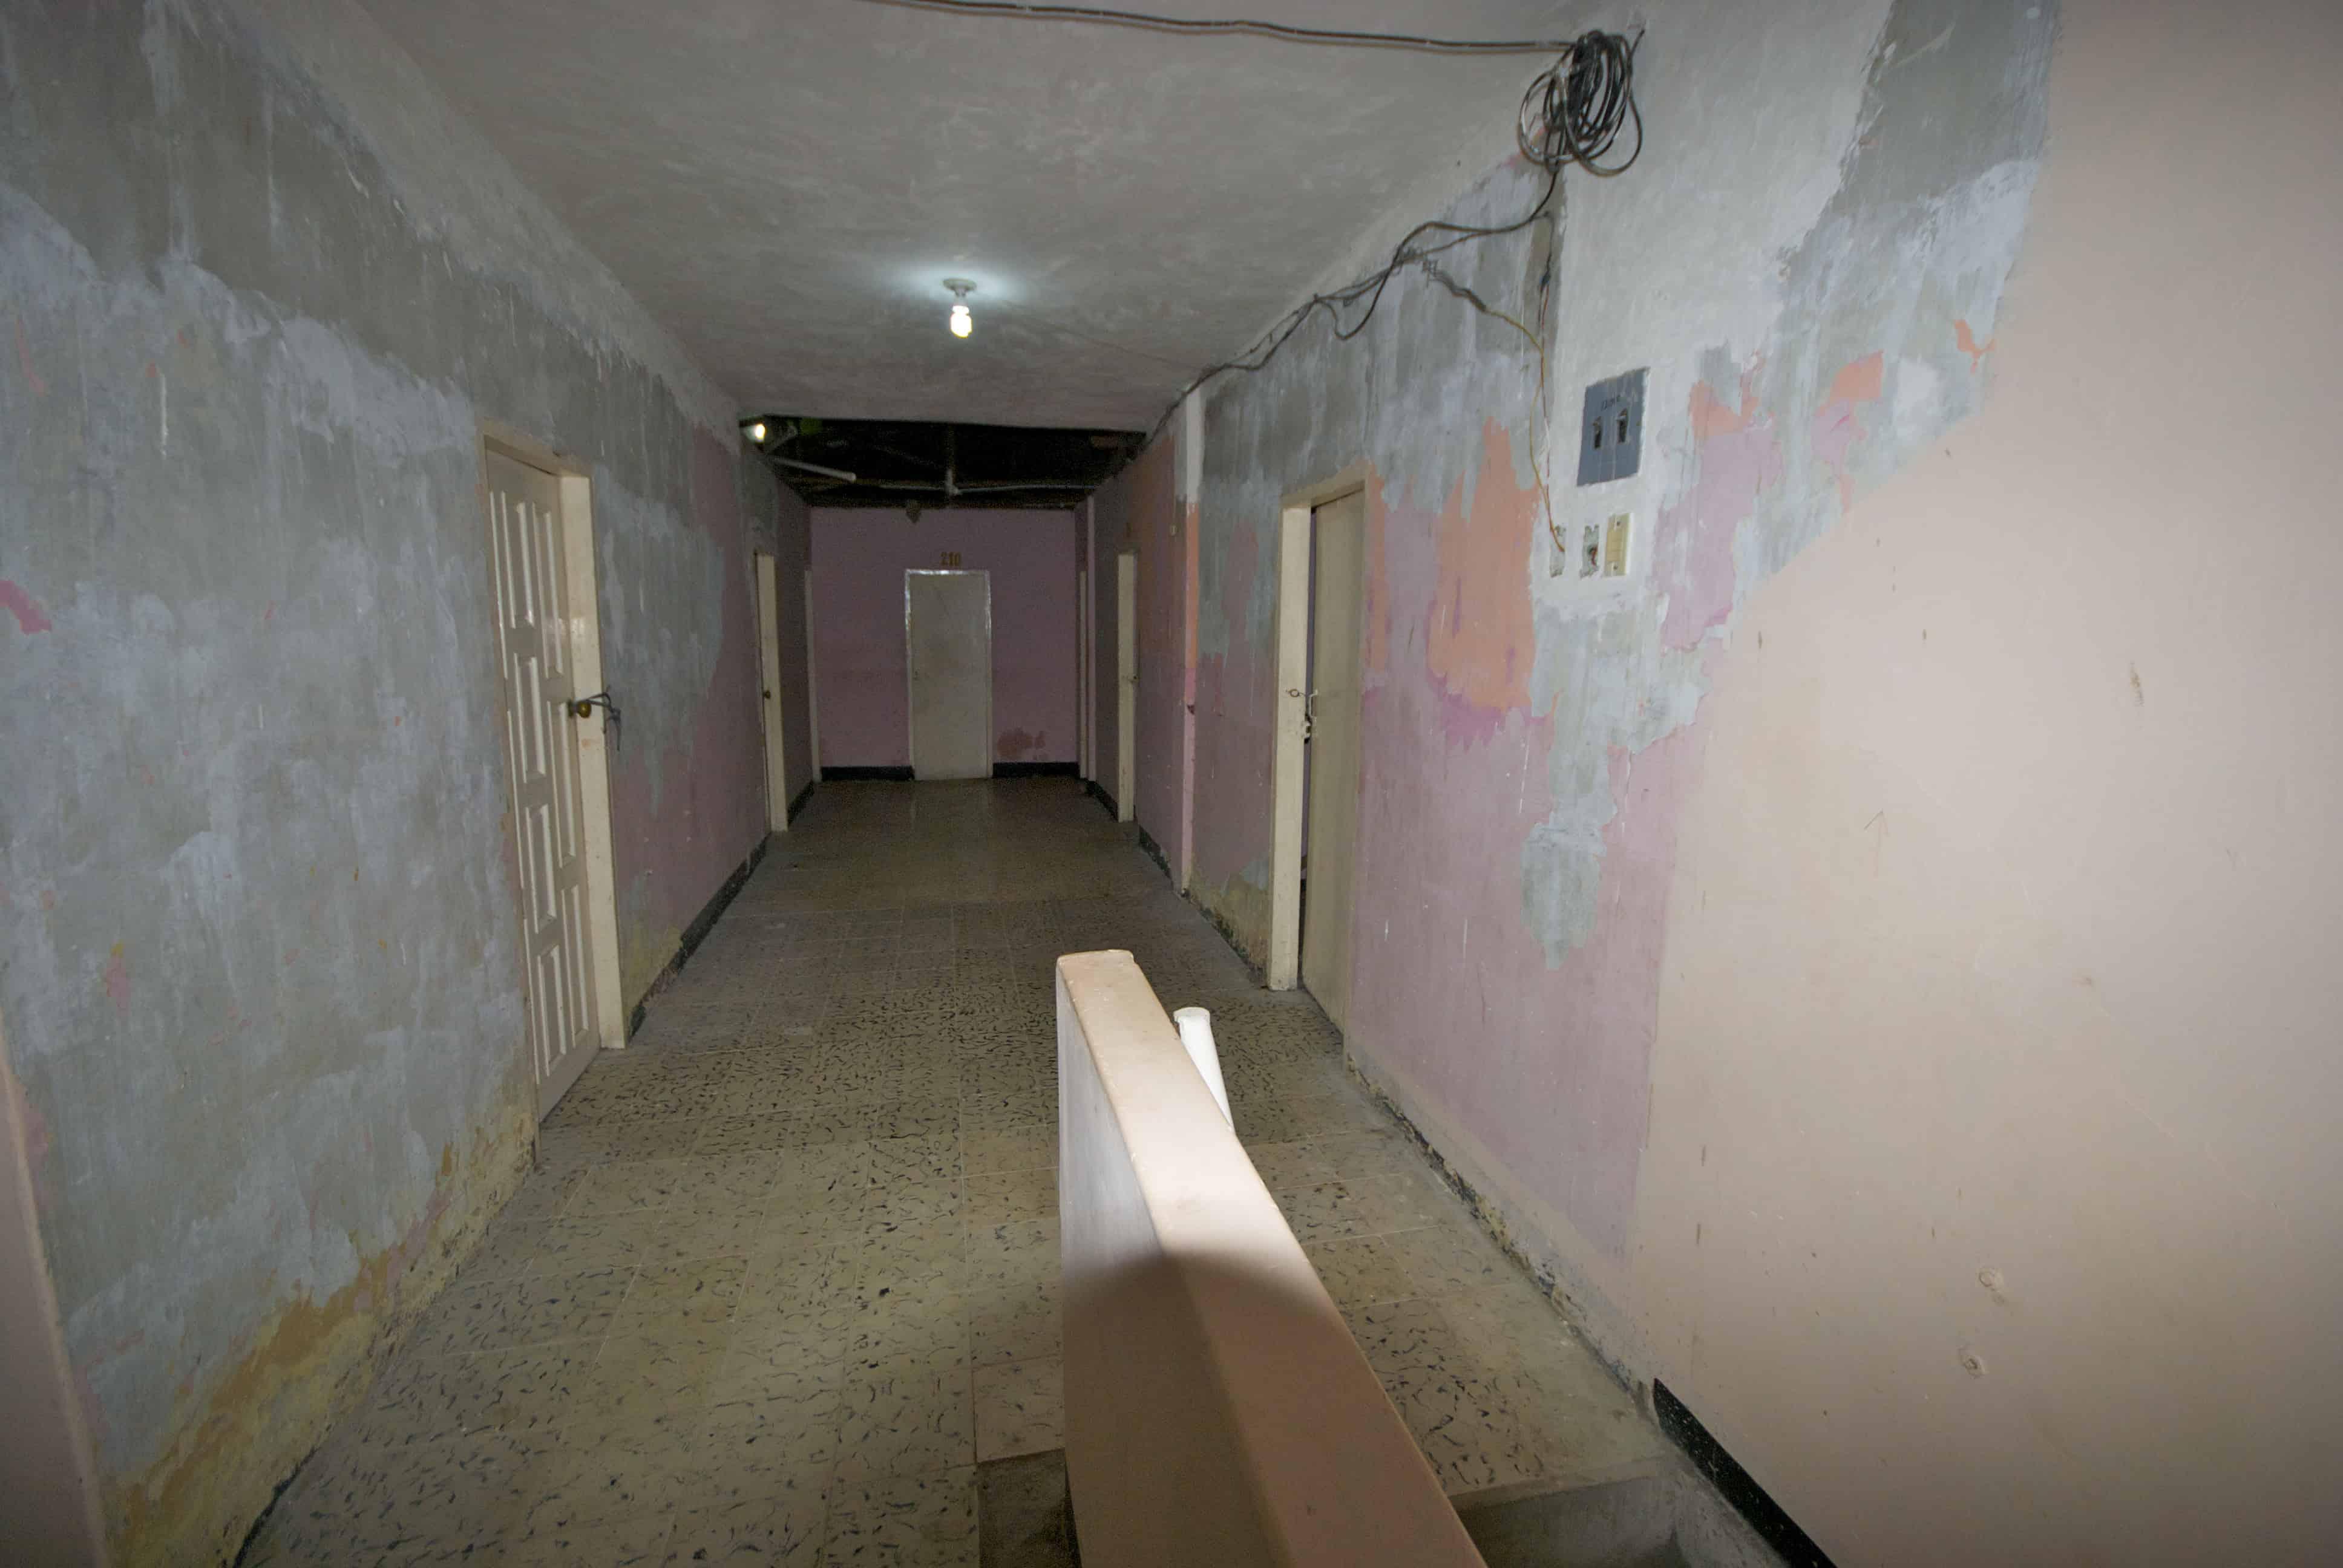 bad hotel hallway overland travel adventures from go see write. Black Bedroom Furniture Sets. Home Design Ideas